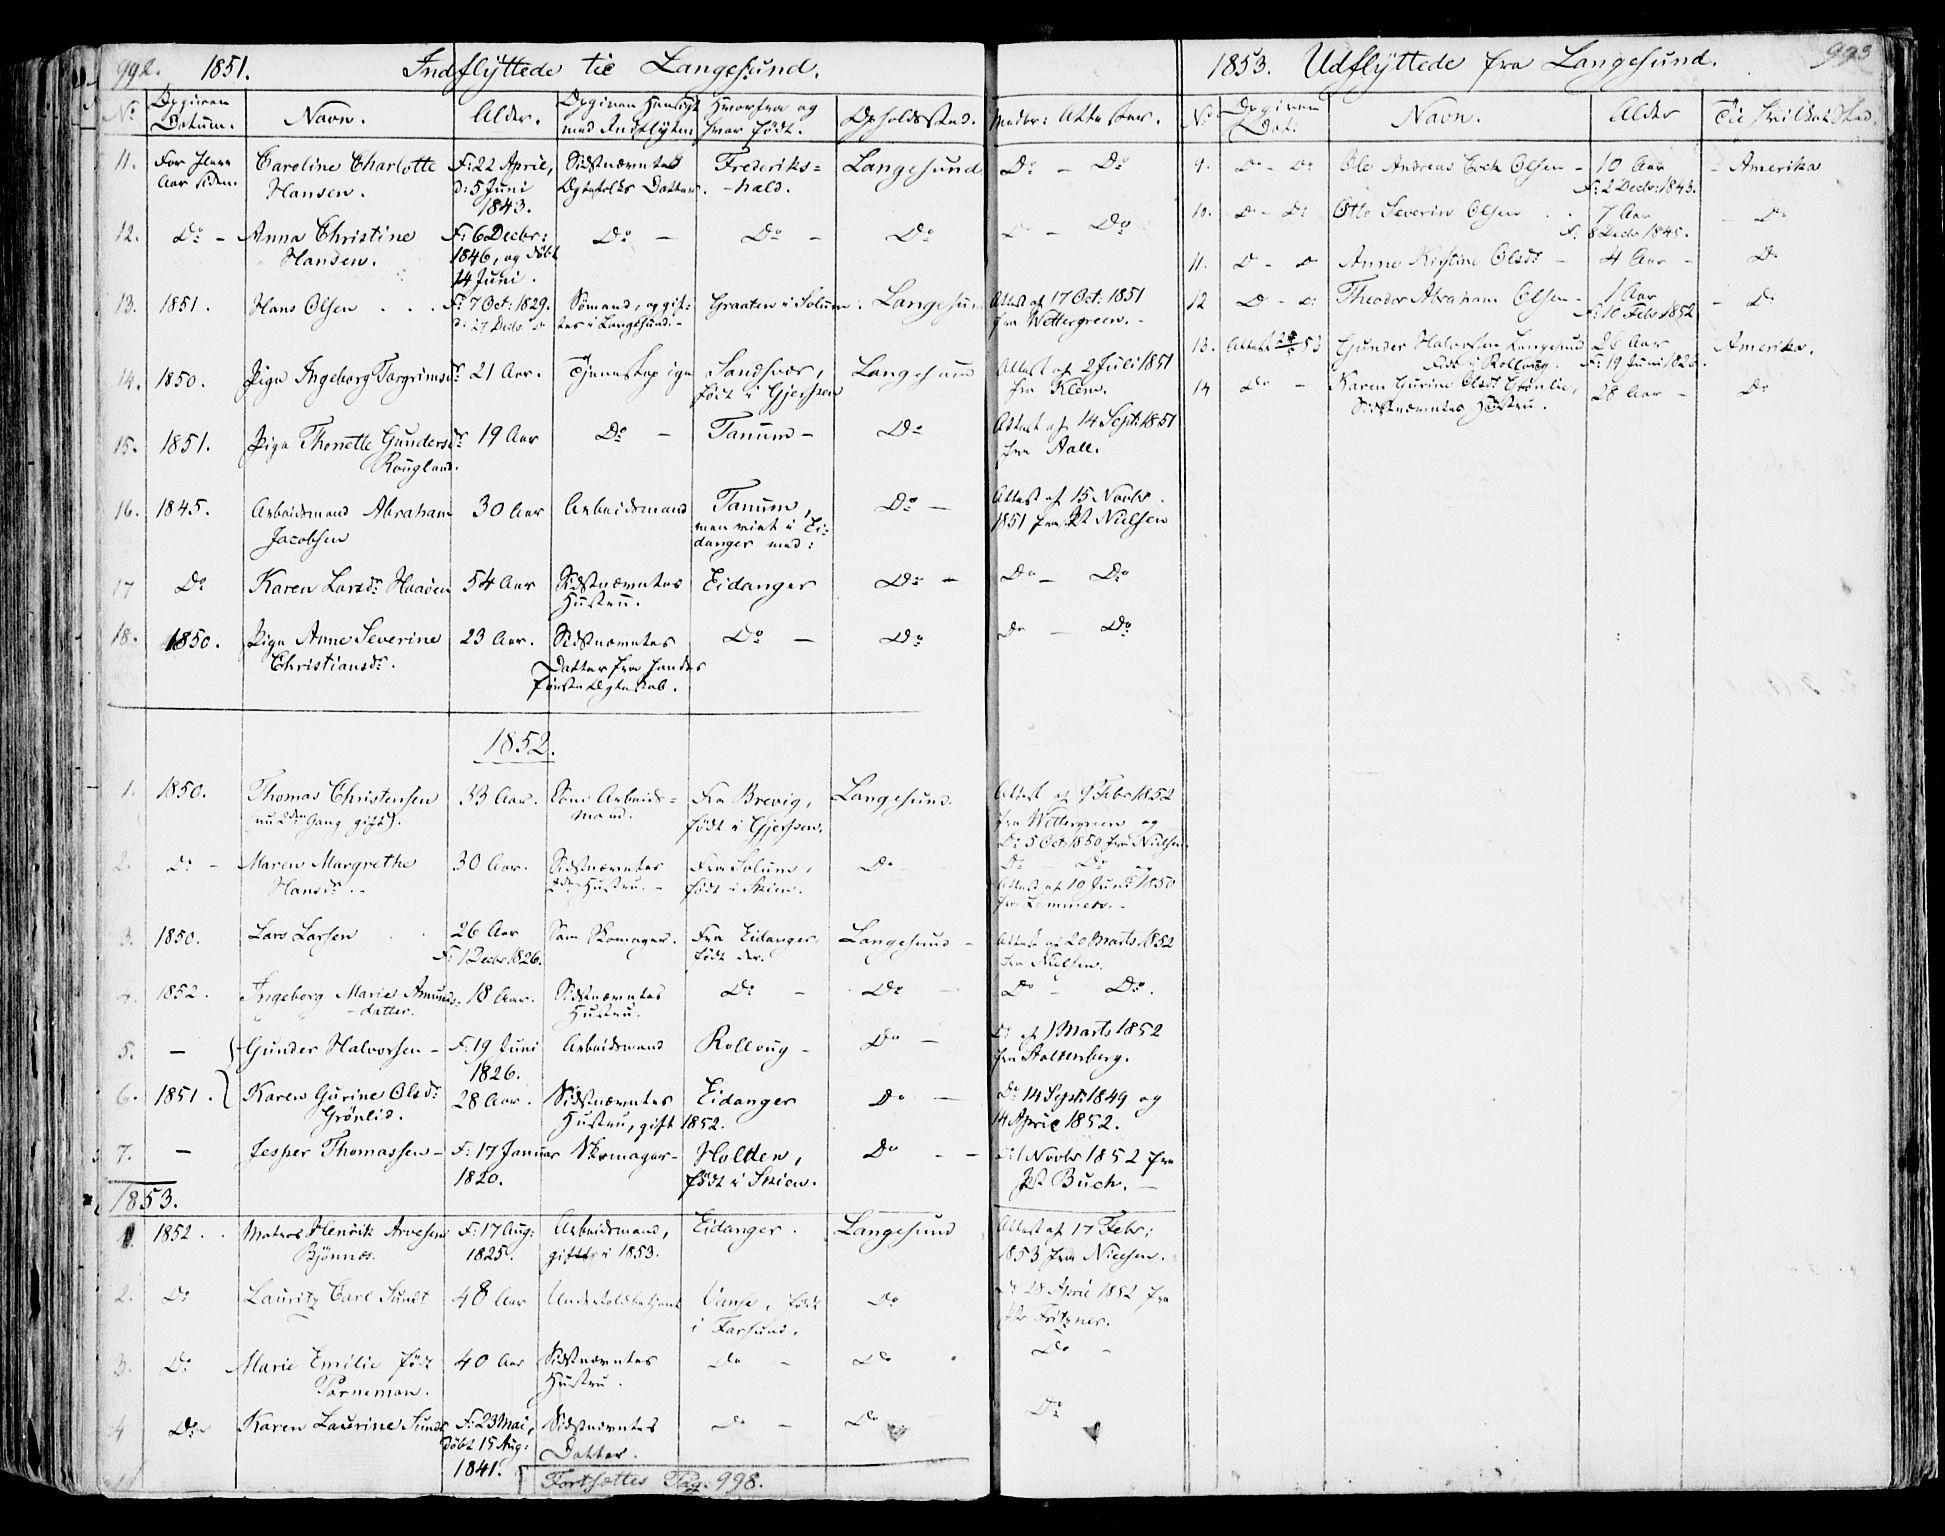 SAKO, Bamble kirkebøker, F/Fa/L0004: Ministerialbok nr. I 4, 1834-1853, s. 992-993